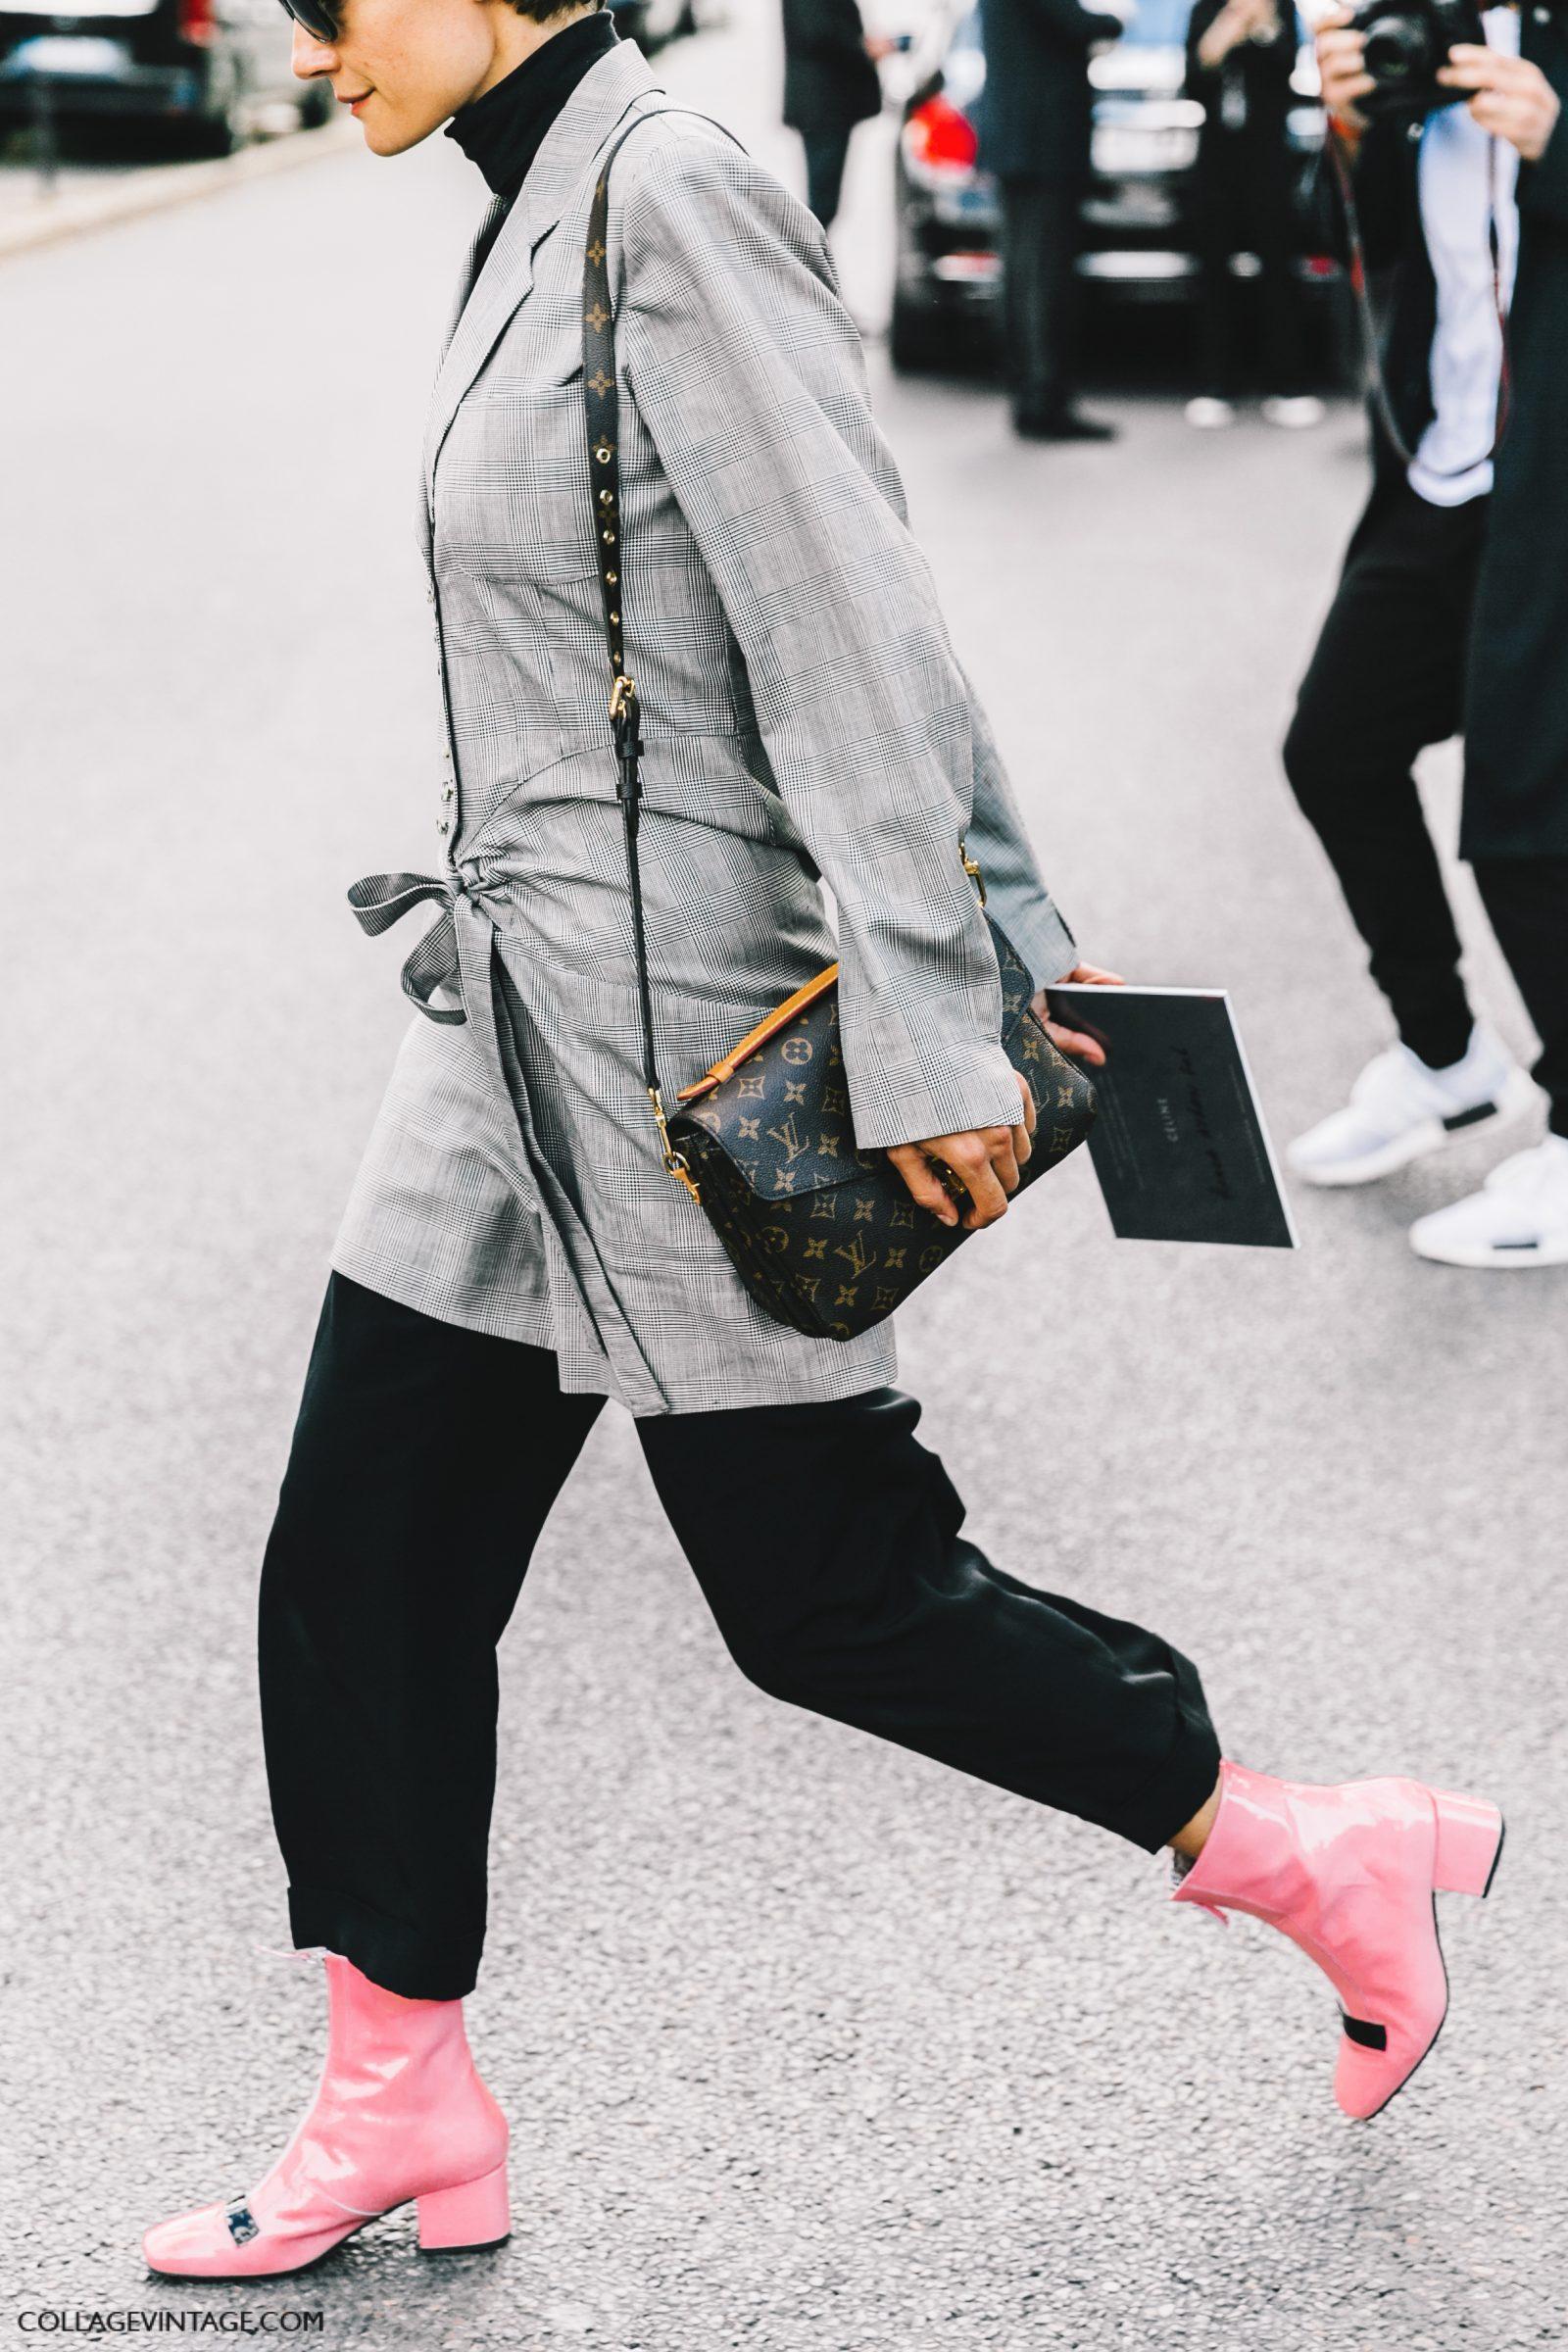 pfw-paris_fashion_week_ss17-street_style-outfits-collage_vintage-valentino-balenciaga-celine-59